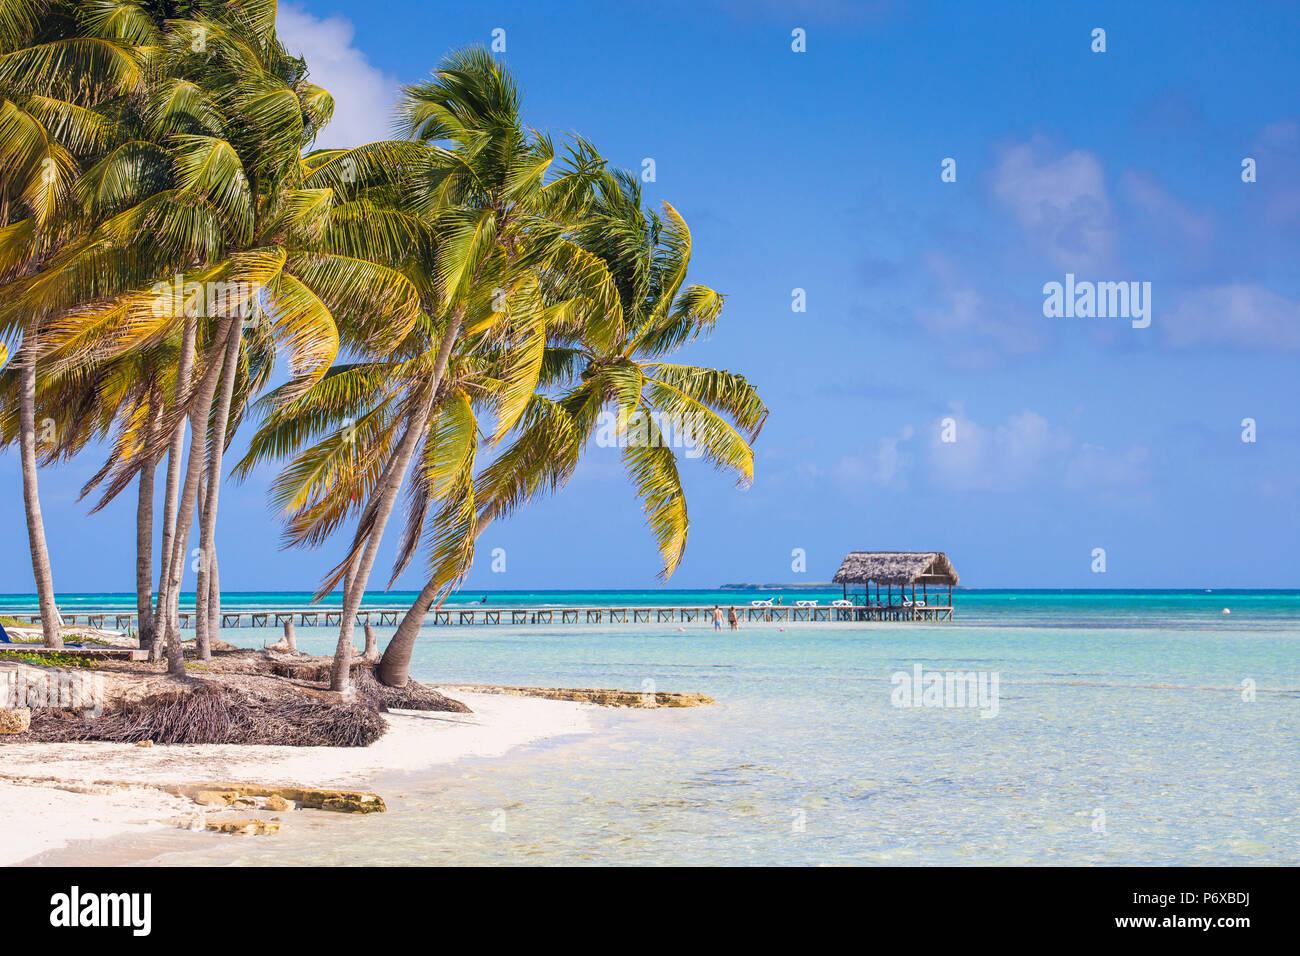 Kuba, Jardines del Rey, Cayo Guillermo, Playa El Paso, Palmen am weißen Sandstrand Stockbild